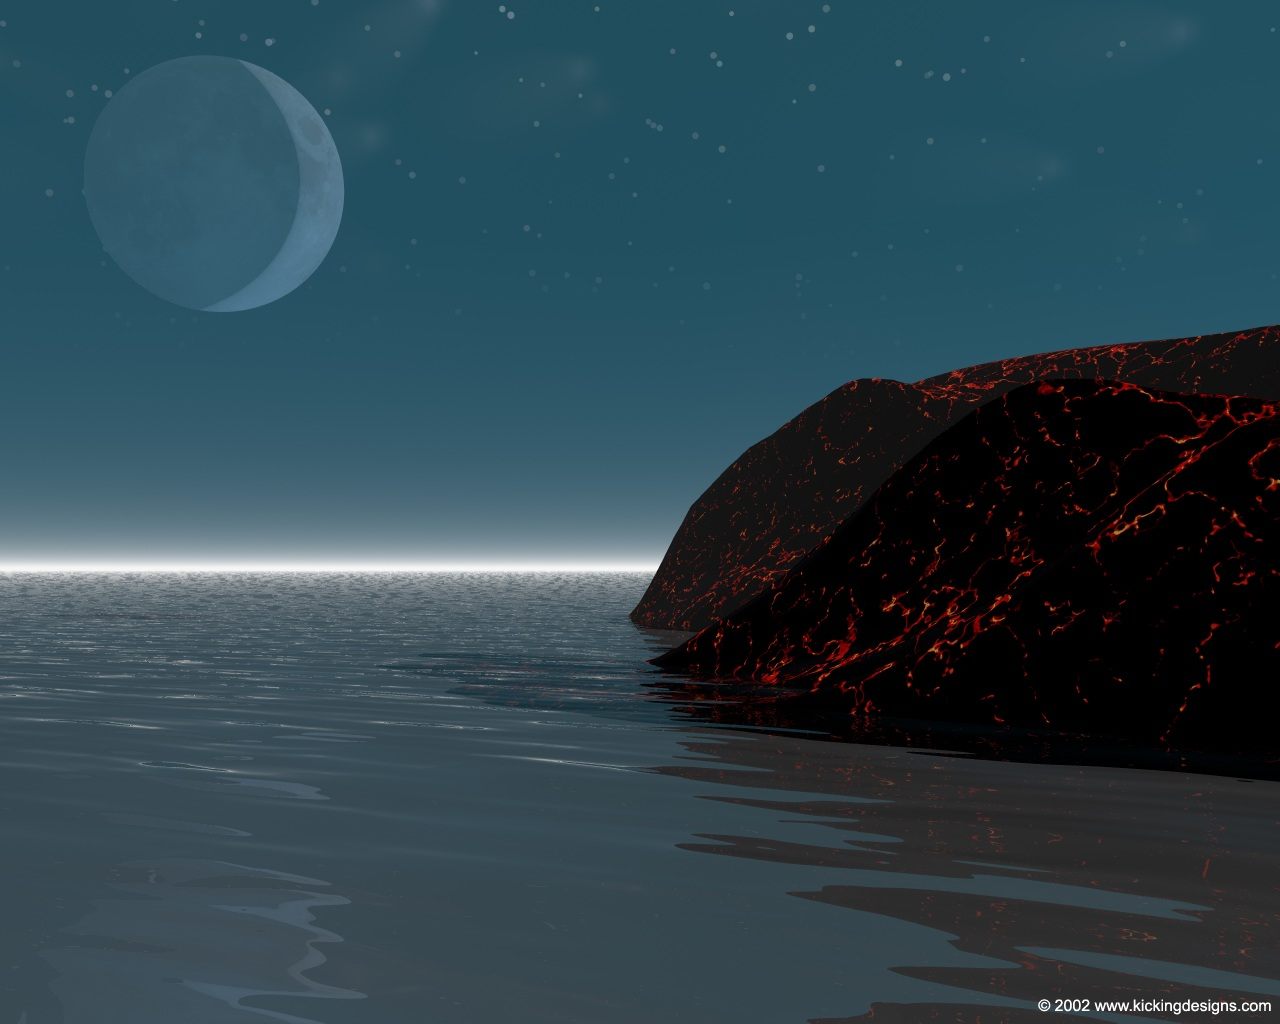 night time - desktop wallpaper 1280 x 1024